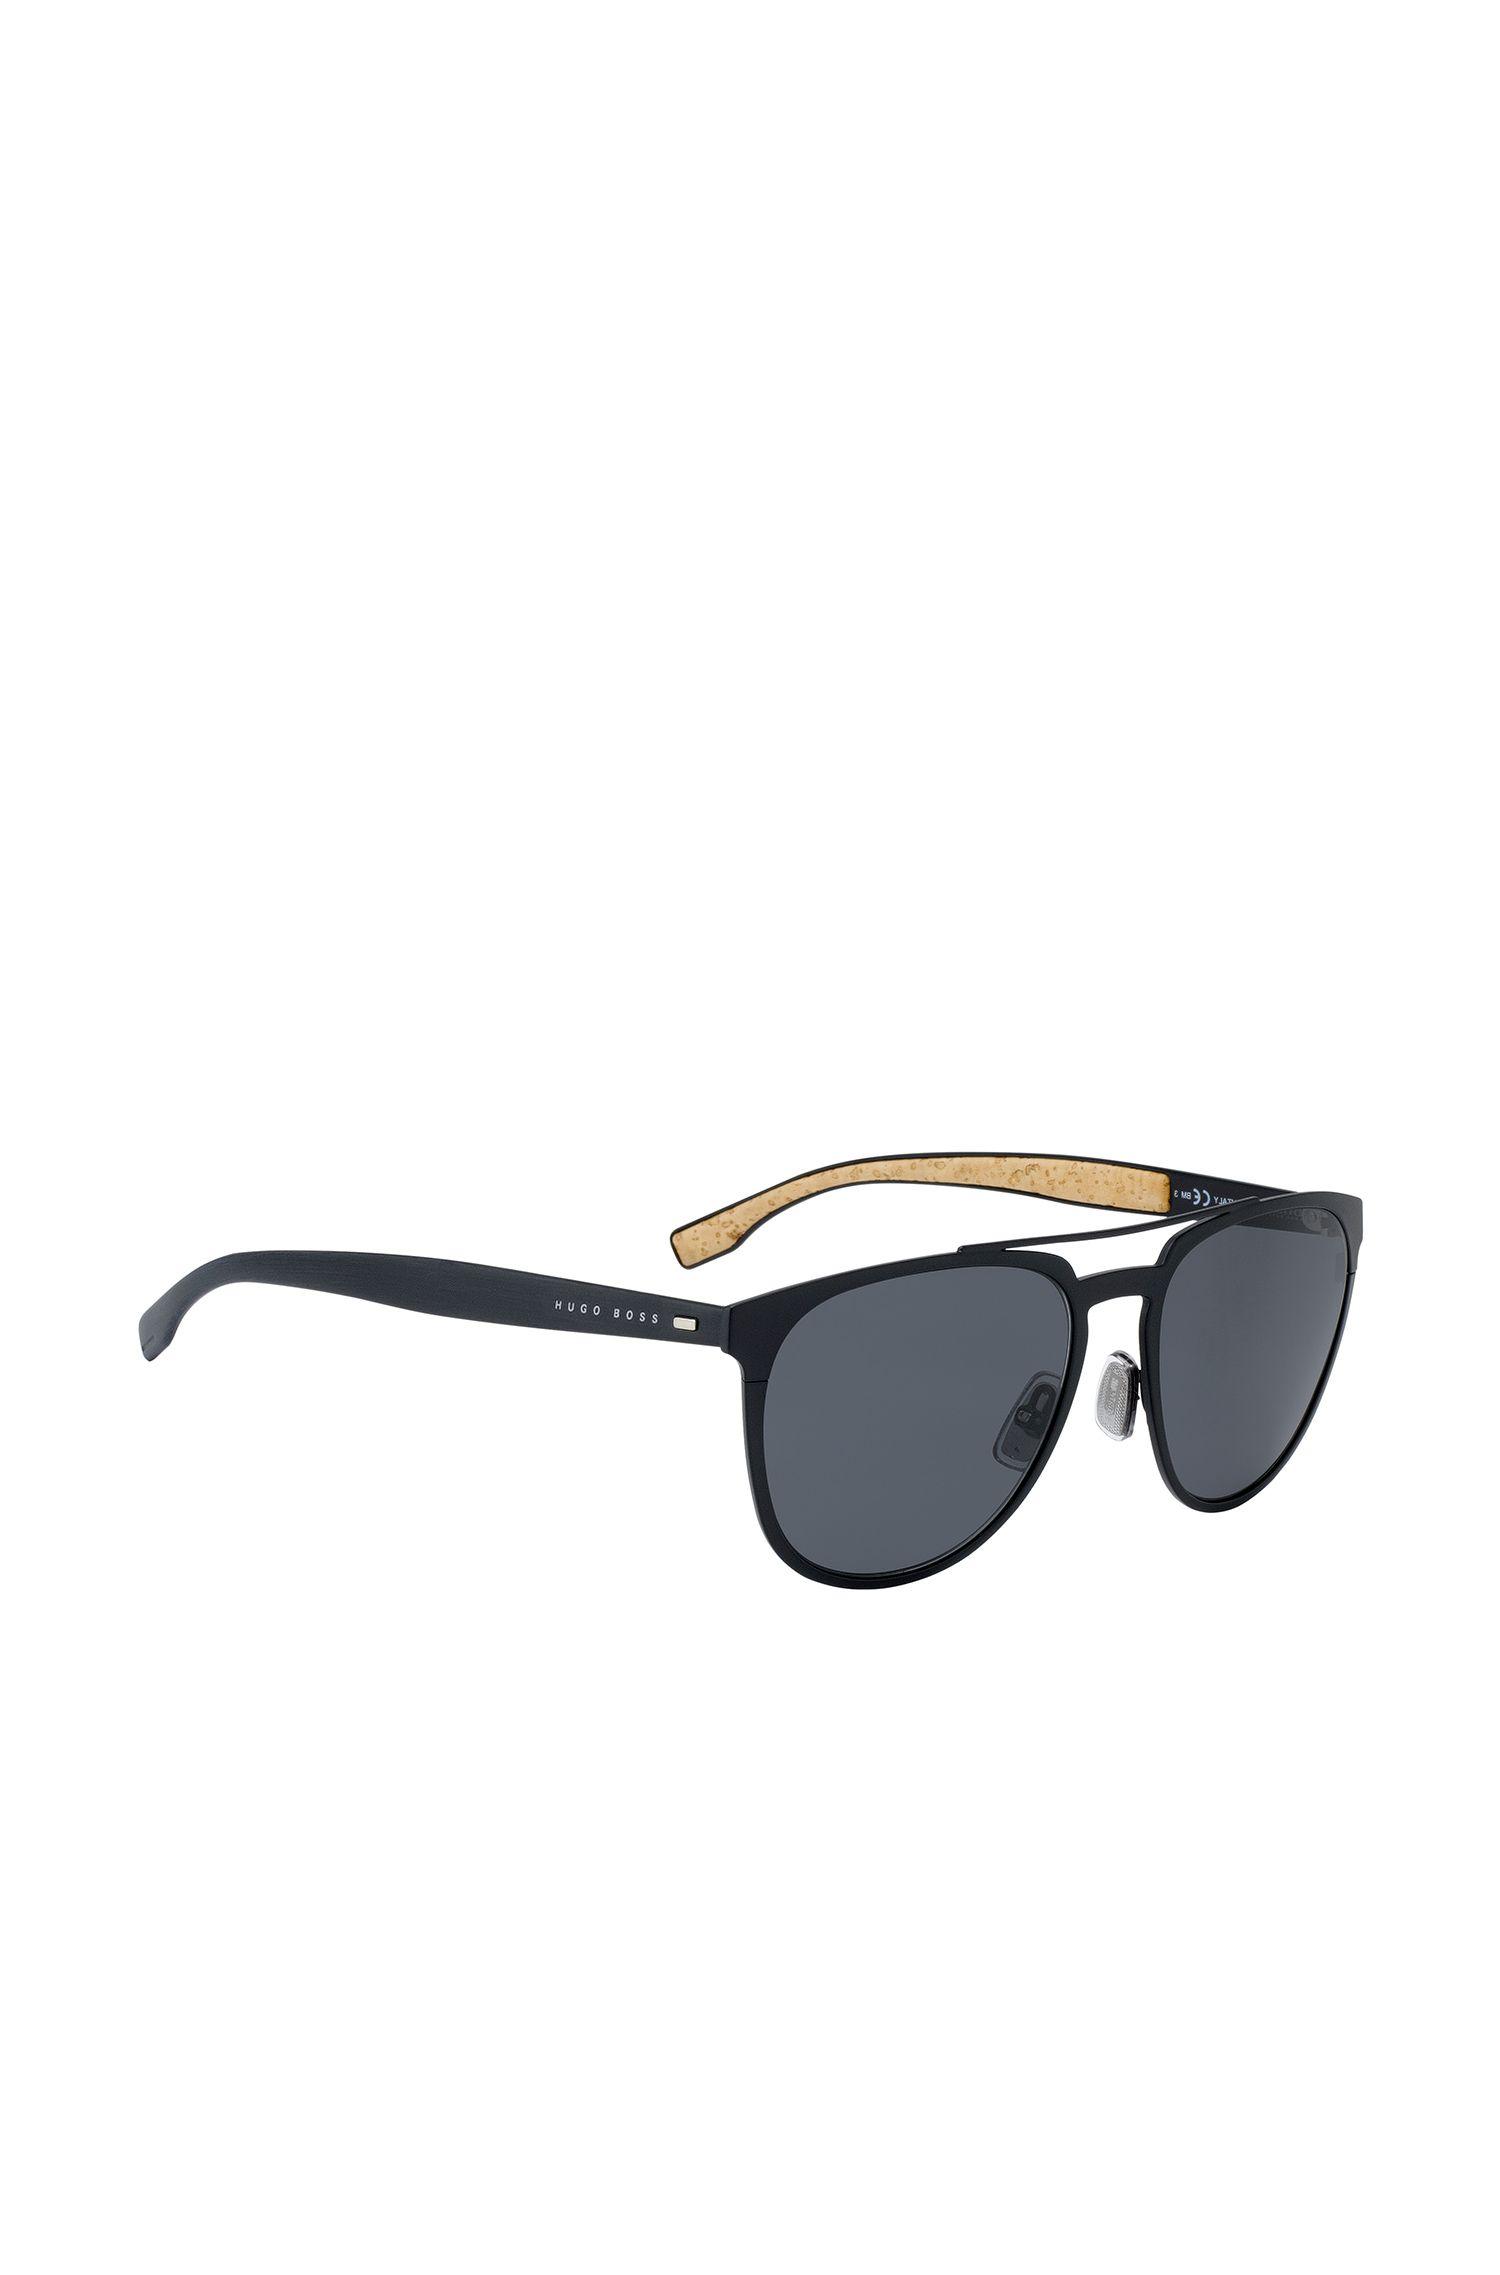 Aviator sunglasses with thin black metallic frames